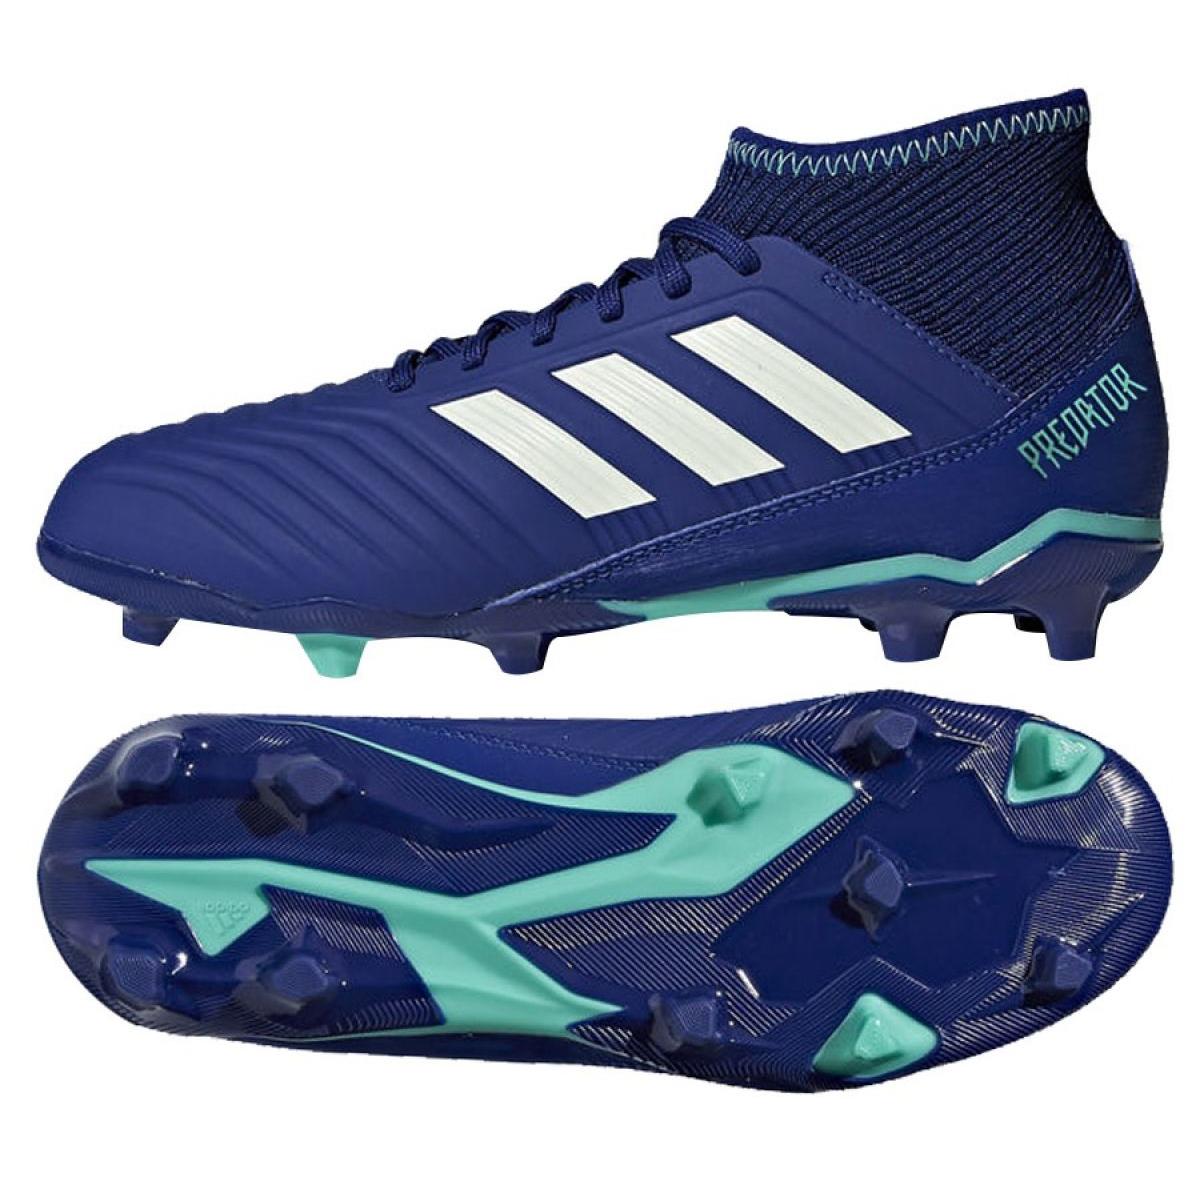 Chaussures De 3 Fg Predator Adidas Foot Junior Cp9012 18 2HIYW9ED